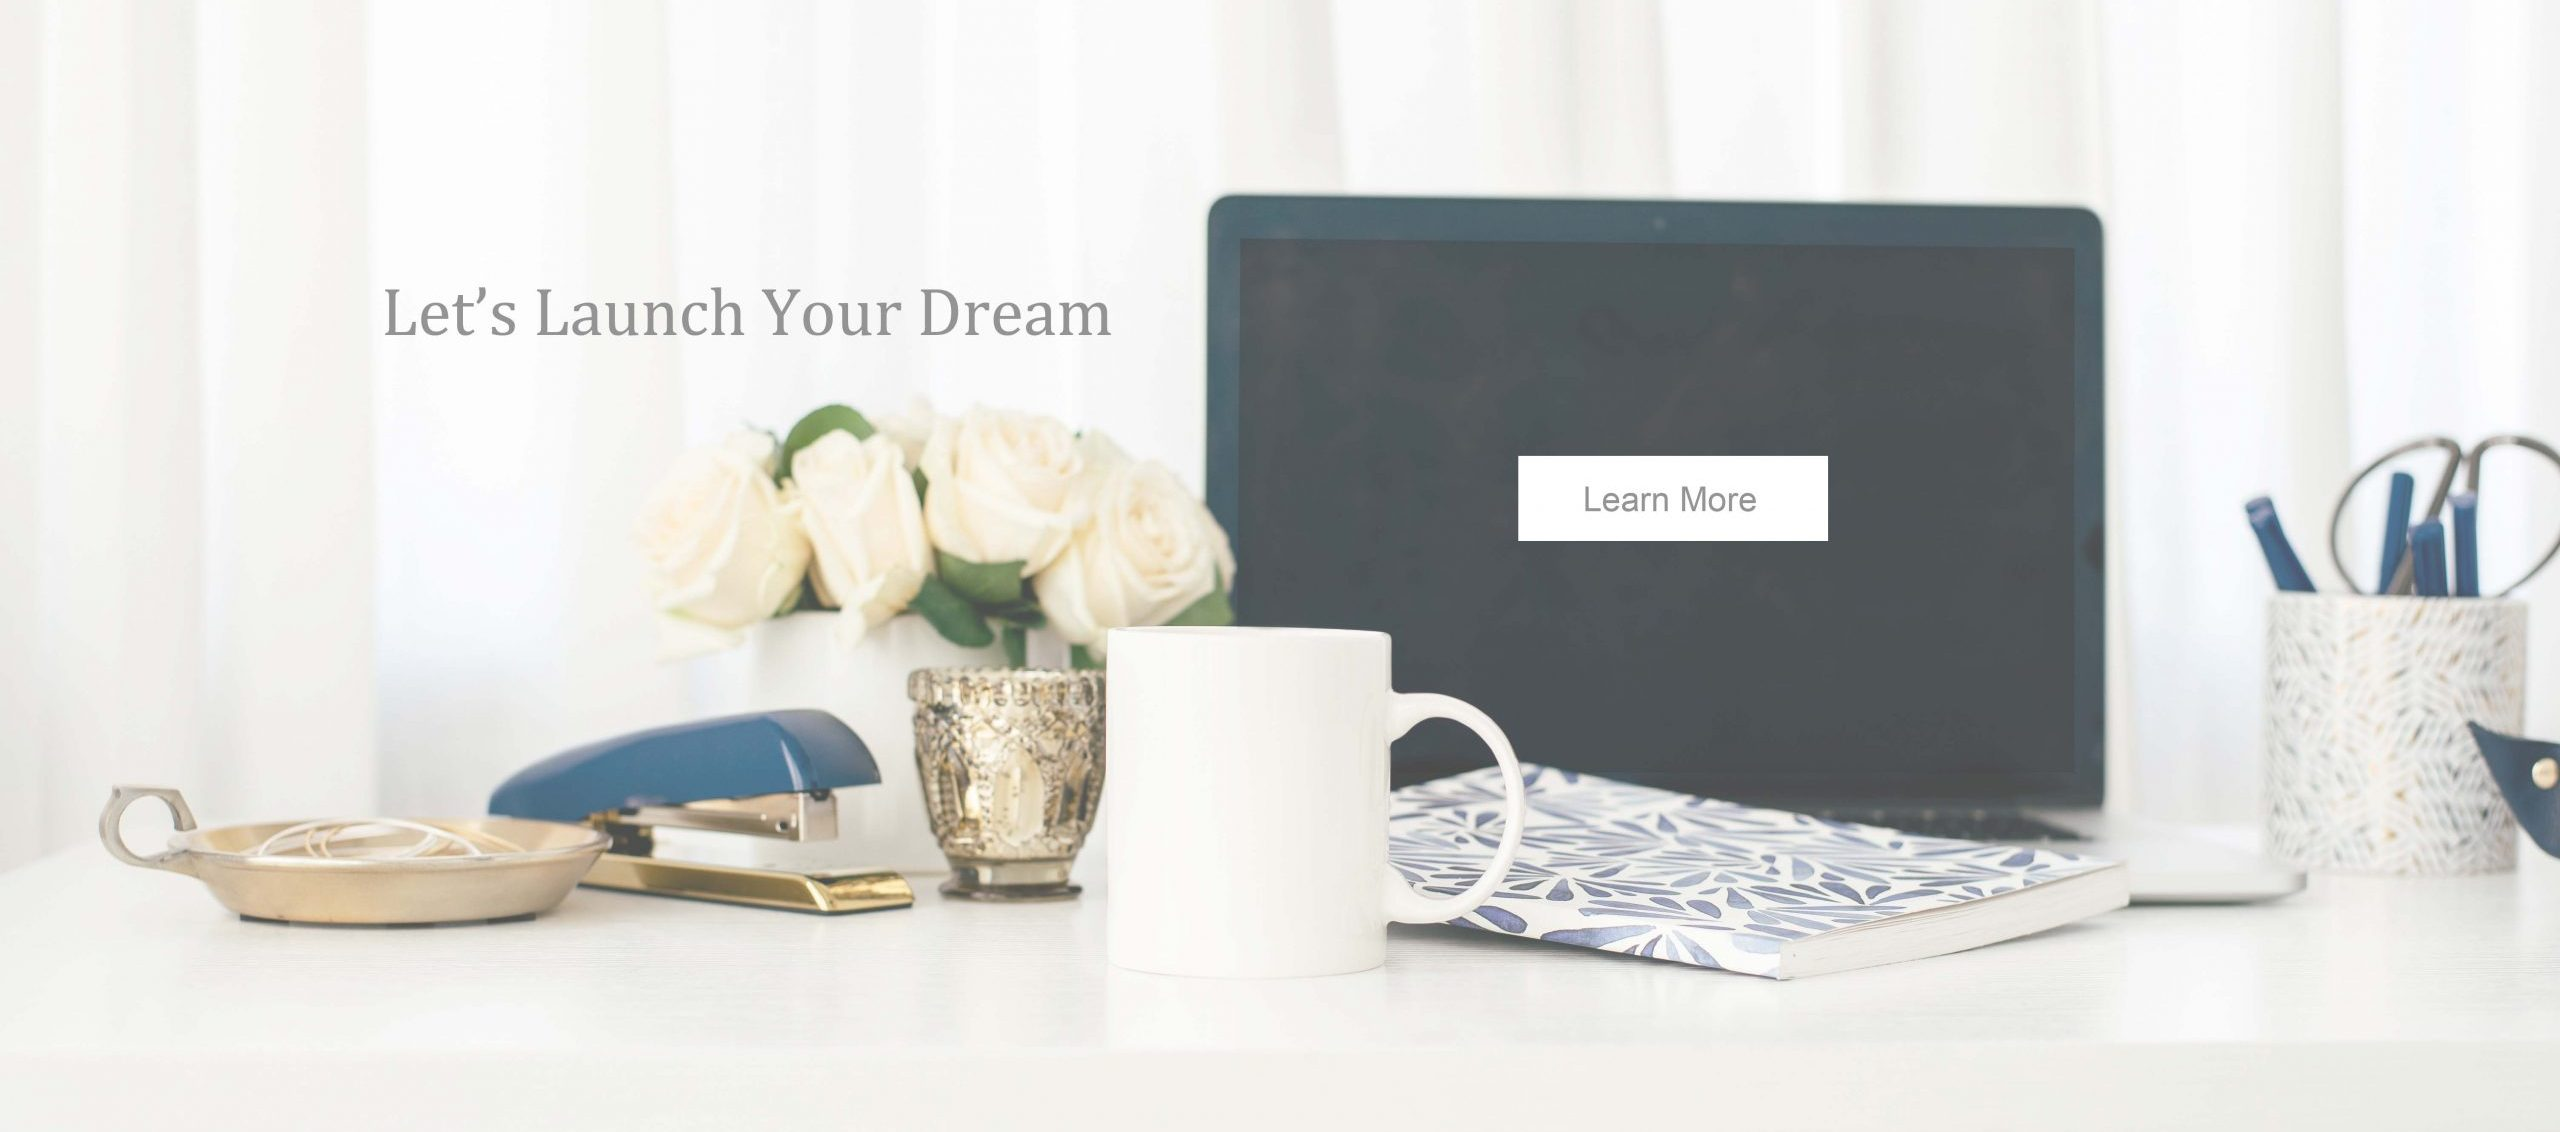 Let's Launch Your Dream